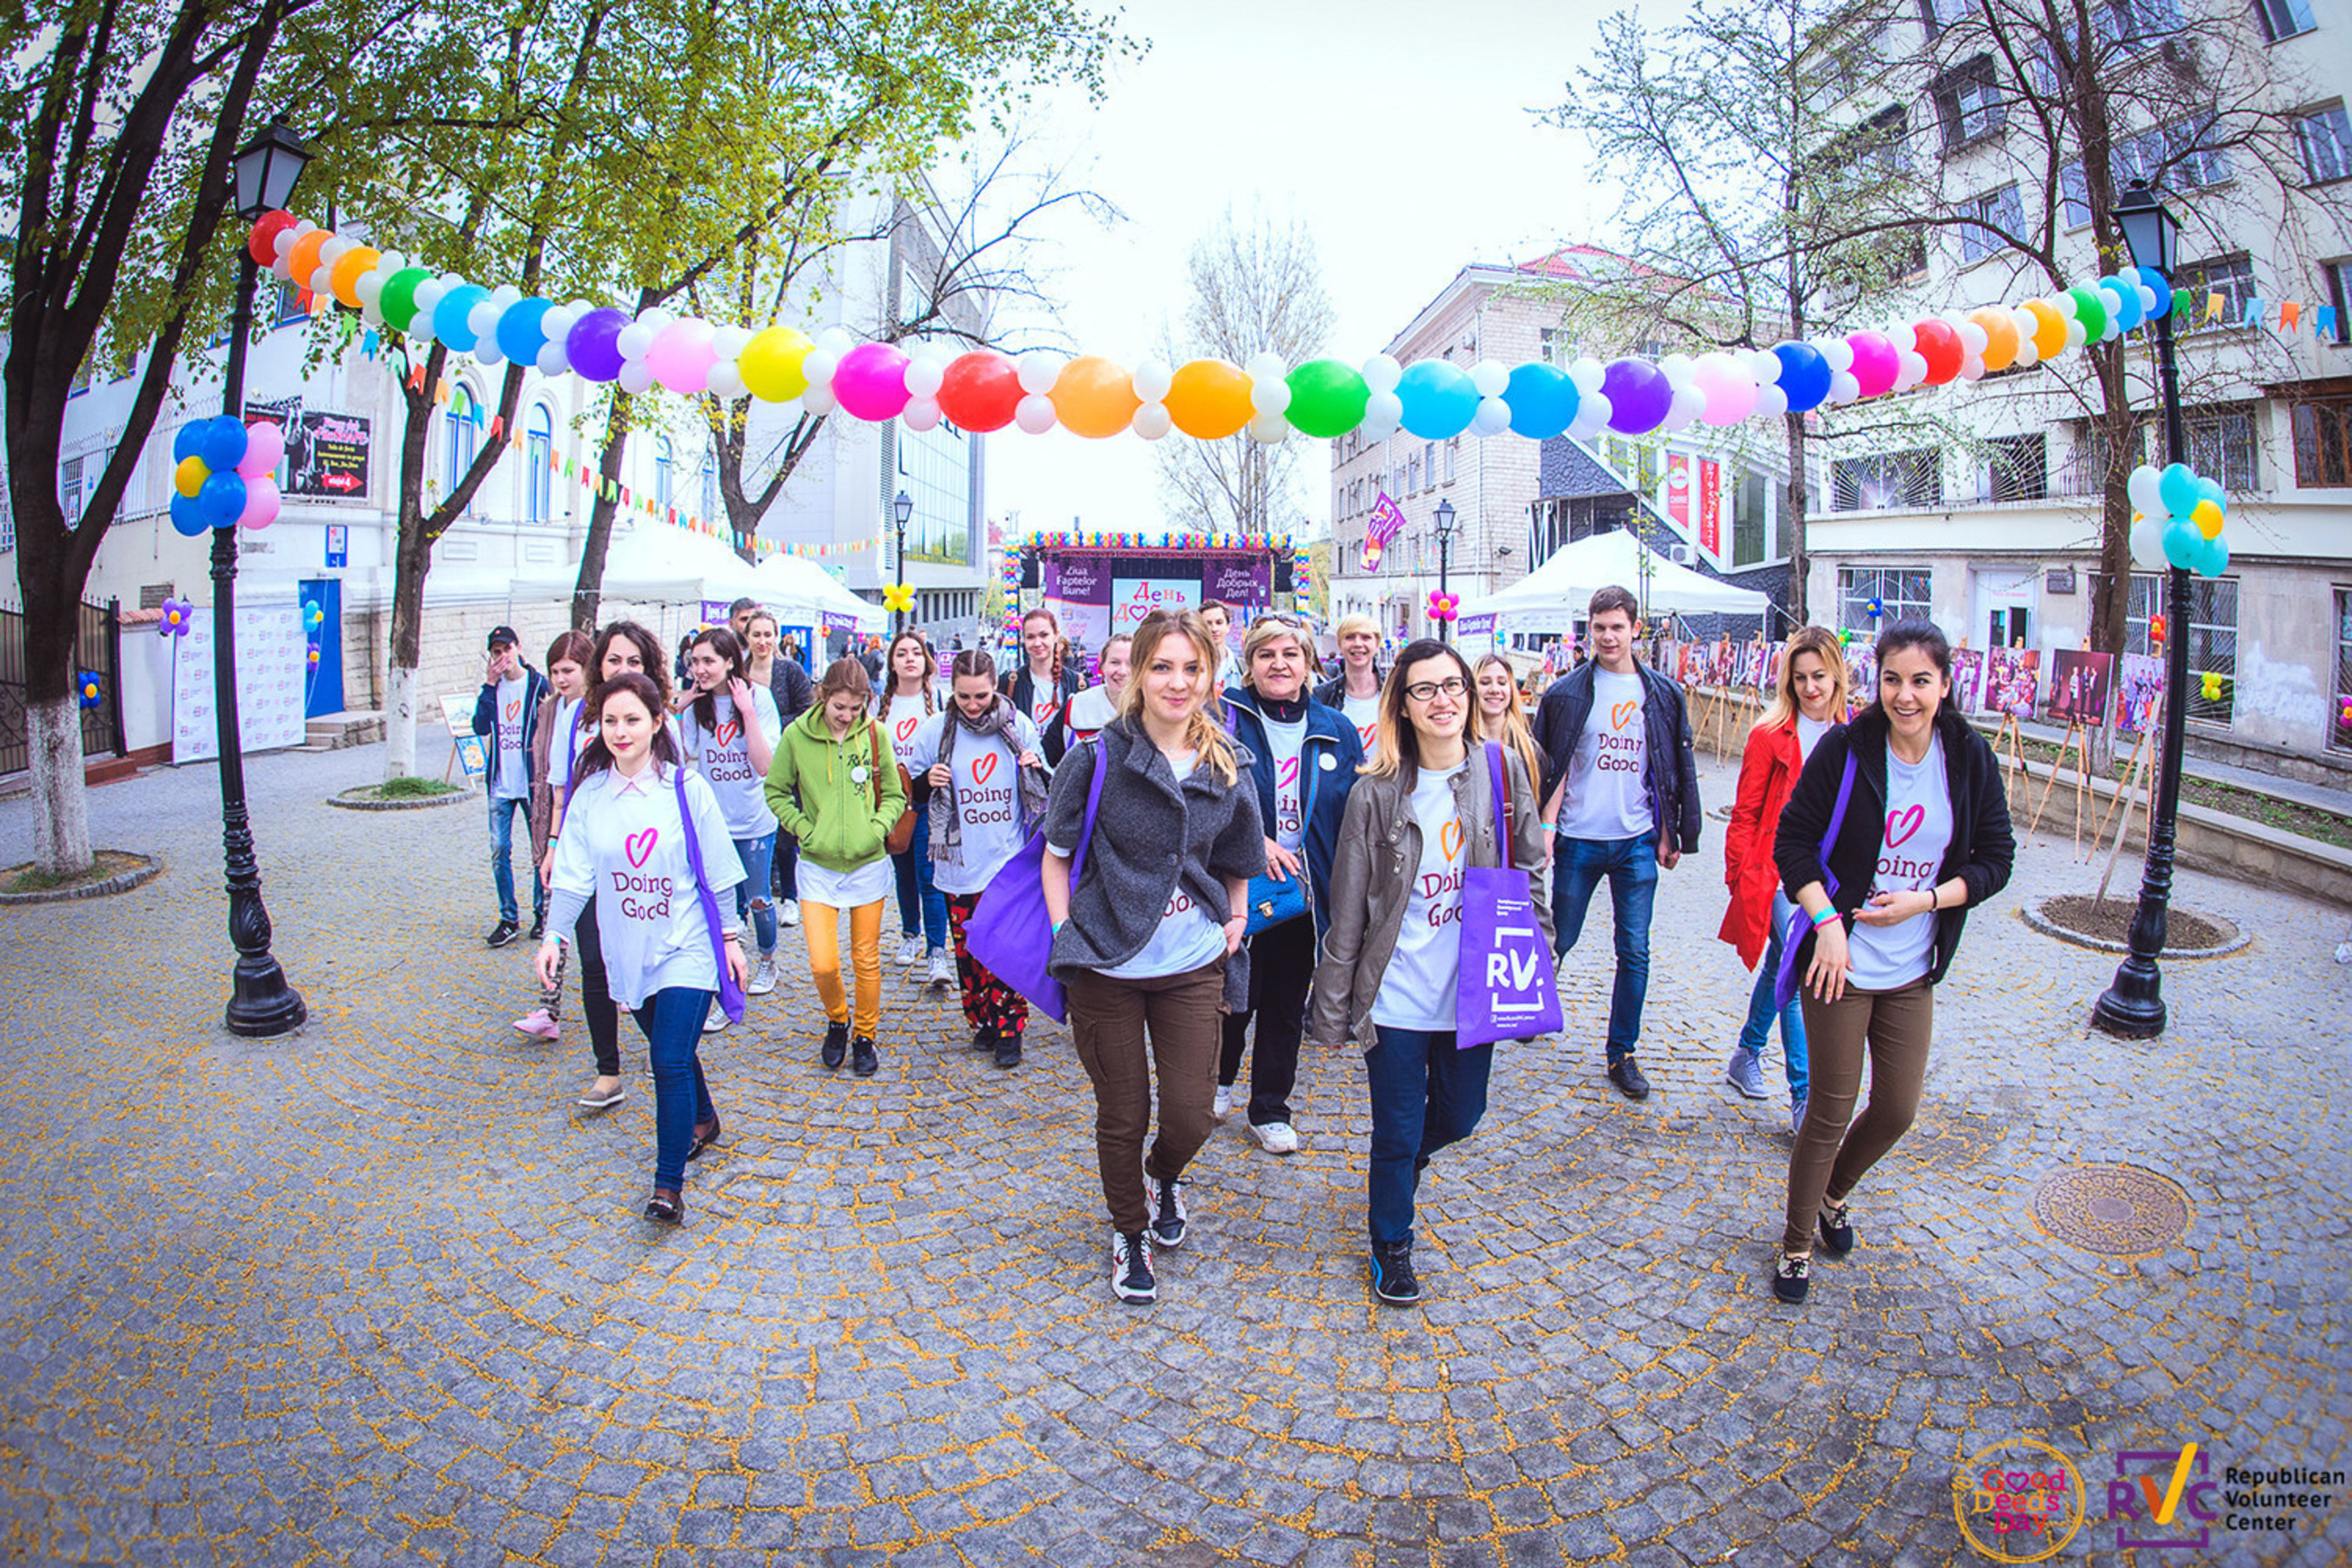 Good Deeds Day Activity at the Republican Volunteer Center in Moldova